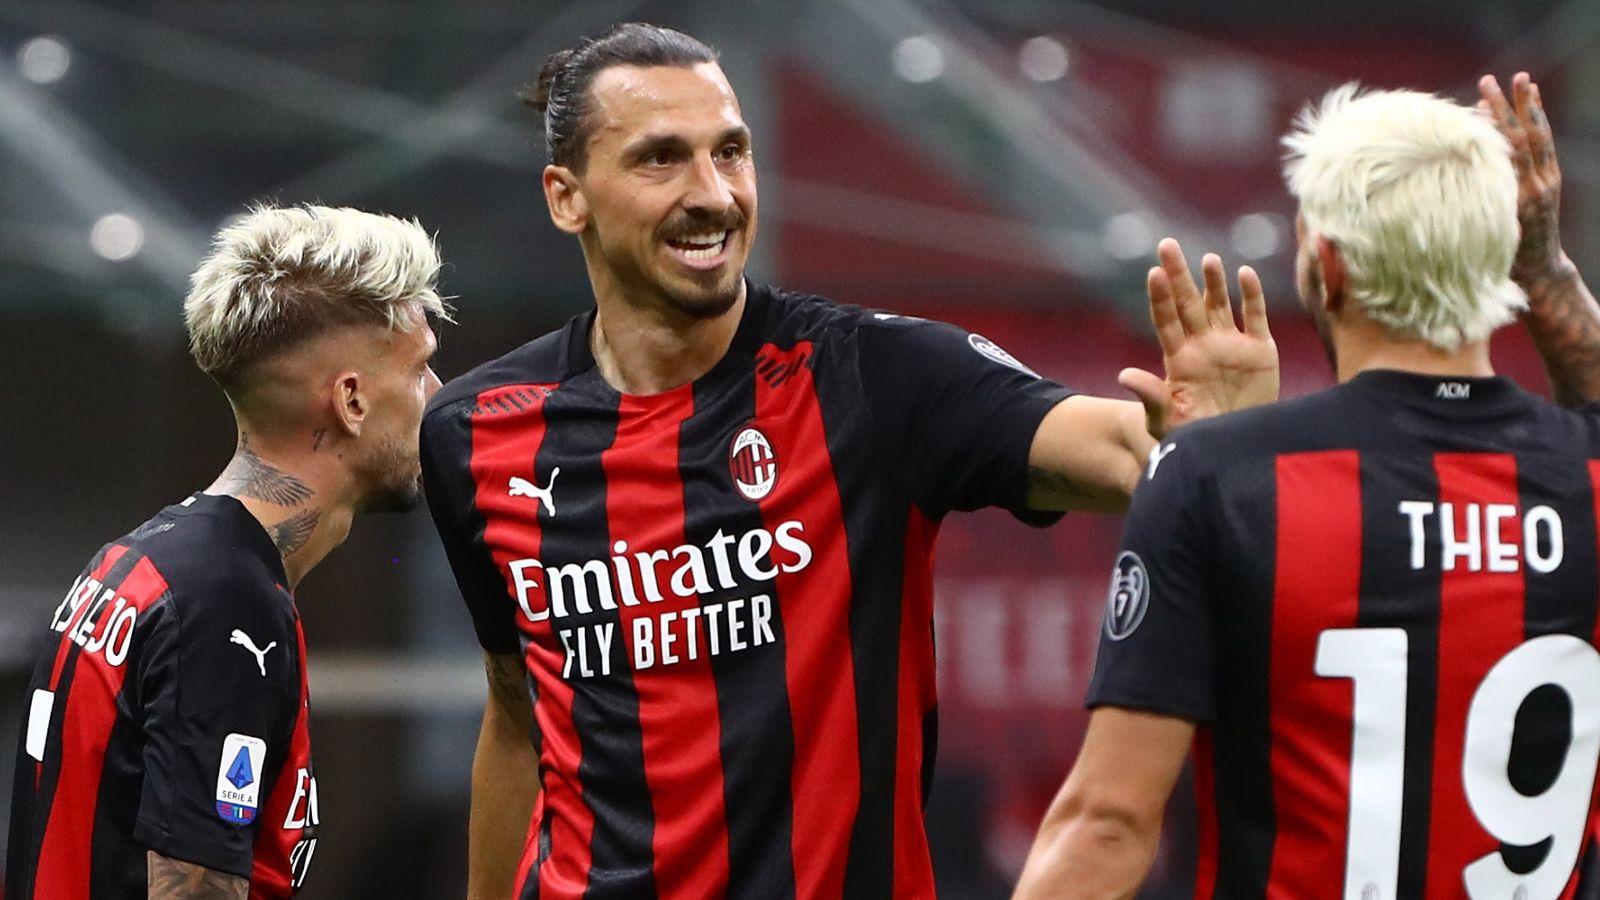 Zlatan Ibrahimovic Ac Milan Striker Nearing New Deal For 2020 21 Season Football News Sky Sports